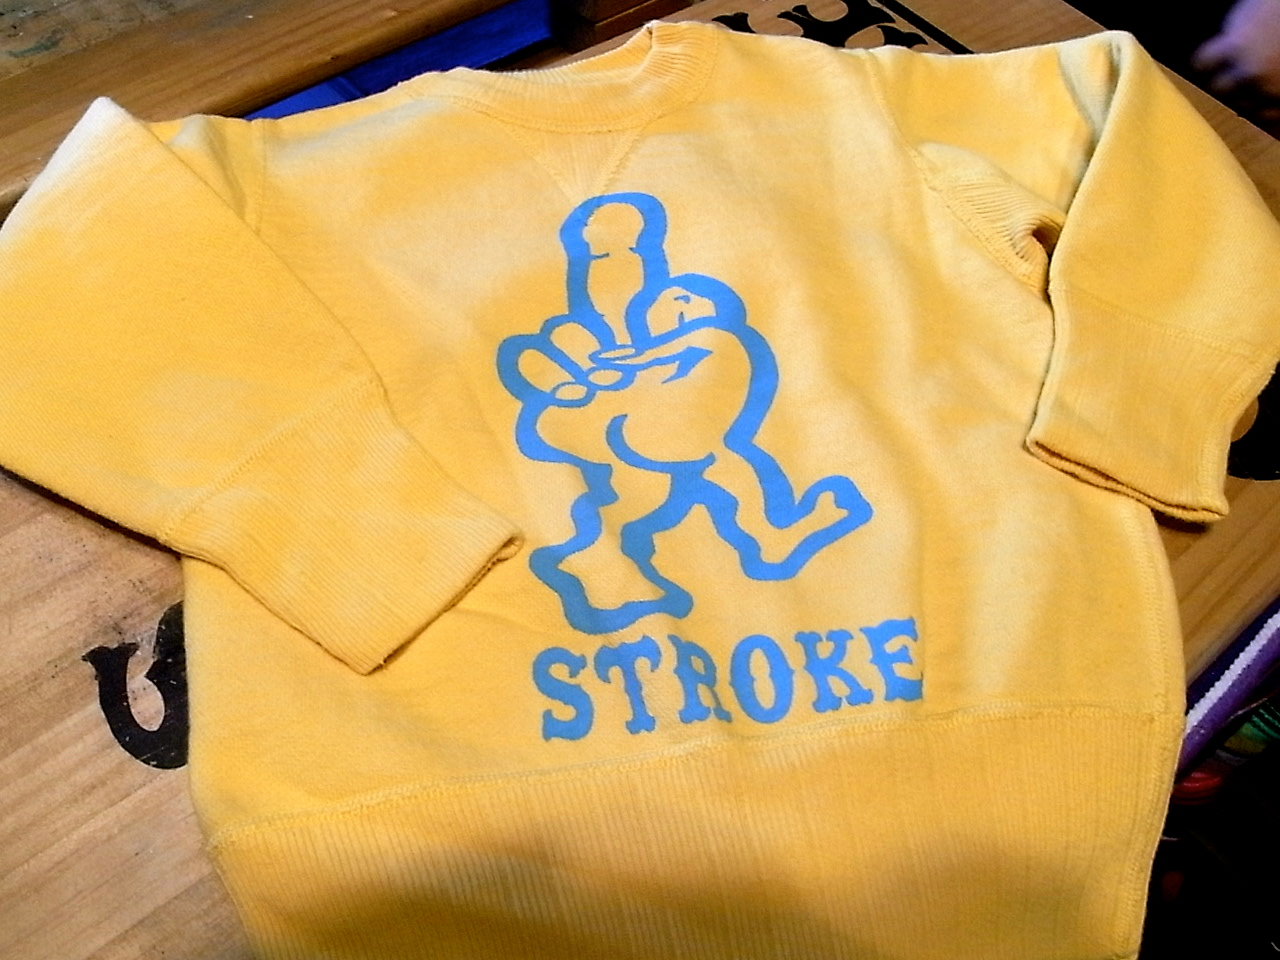 1/31 STROKE PRINT&STENCIL WORKS !!!!_d0101000_18292523.jpg